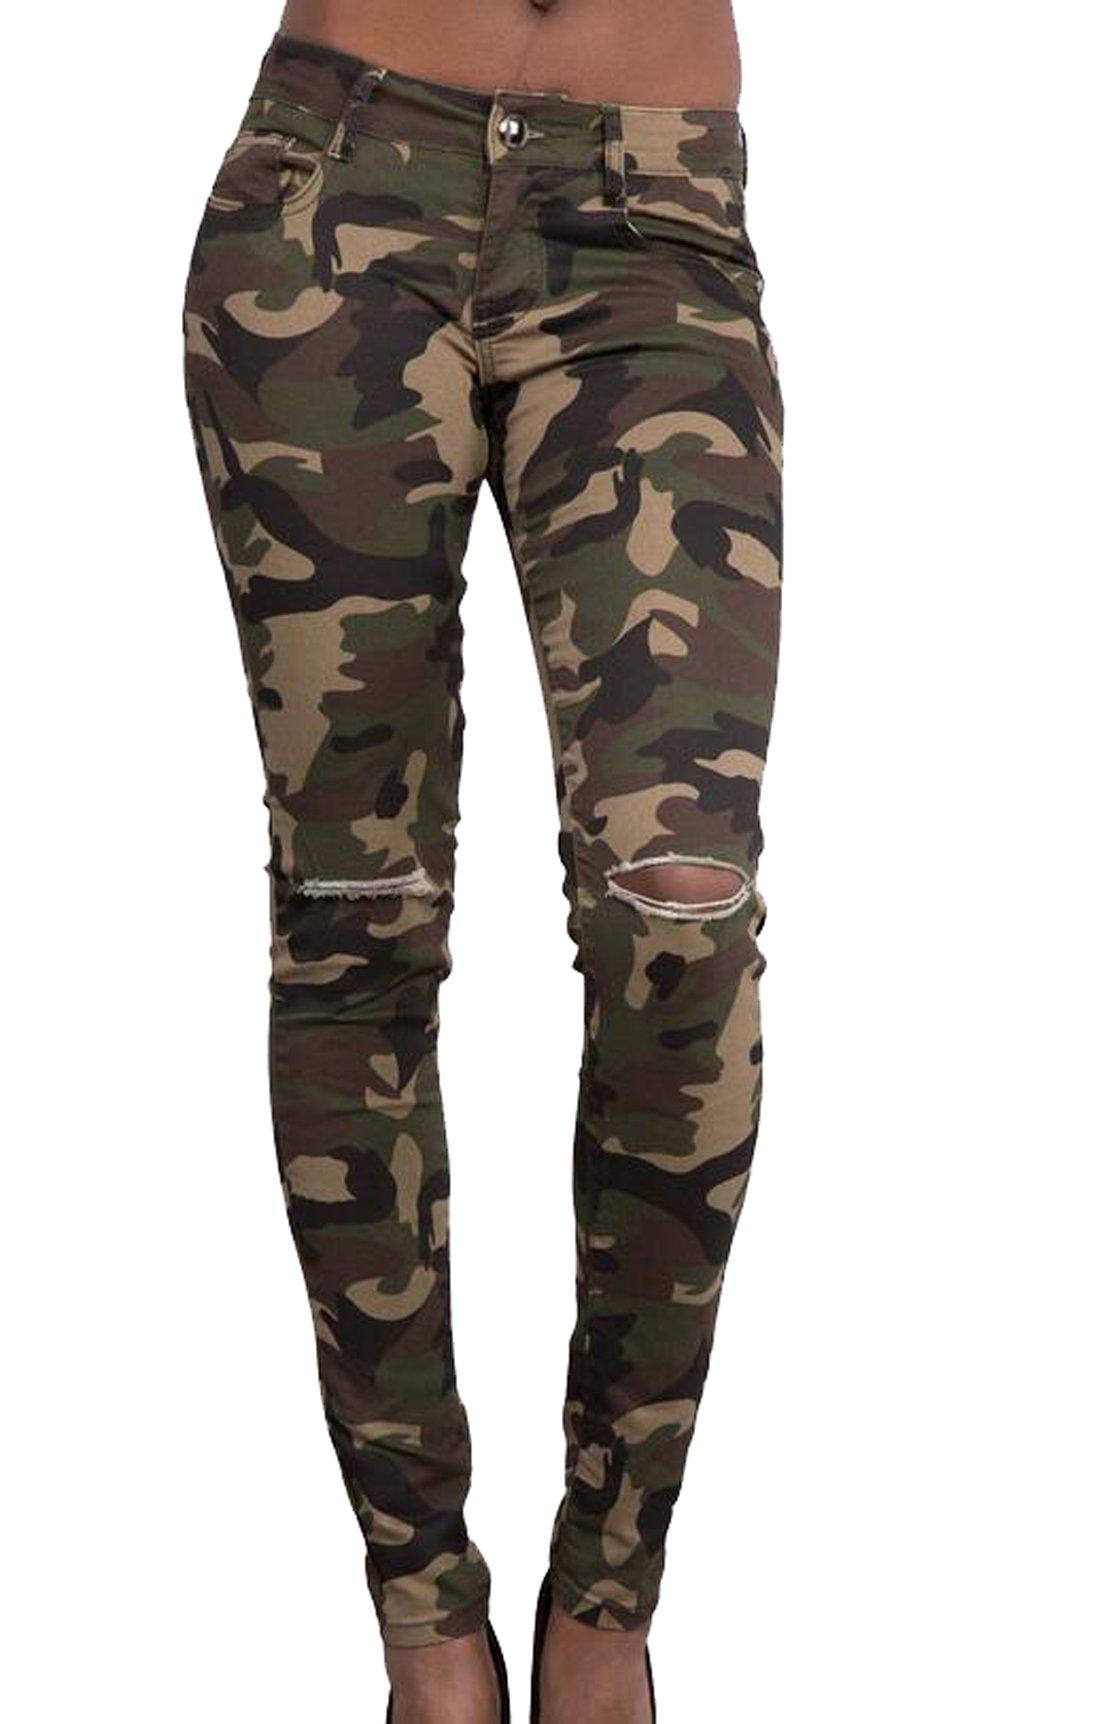 ARTFFEL Womens High Waist Skinny Leg Knee Holes Pencil Pants Field camouflage XL